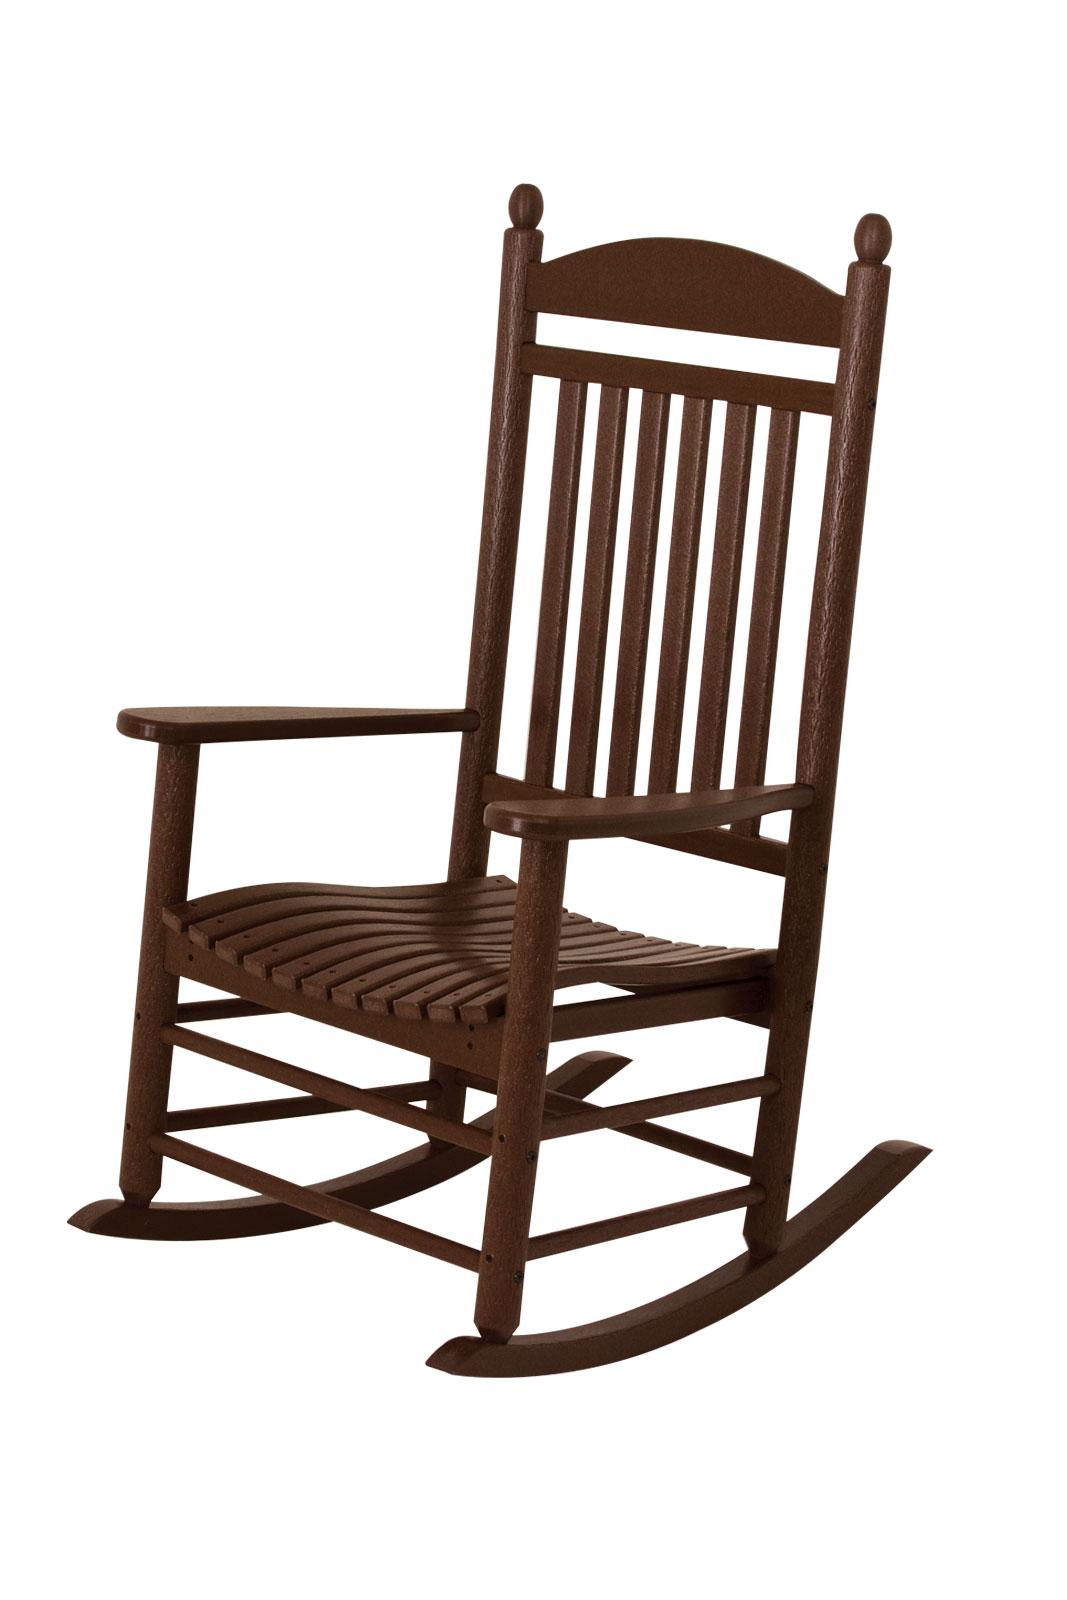 jefferson recycled plastic rocker chair teak